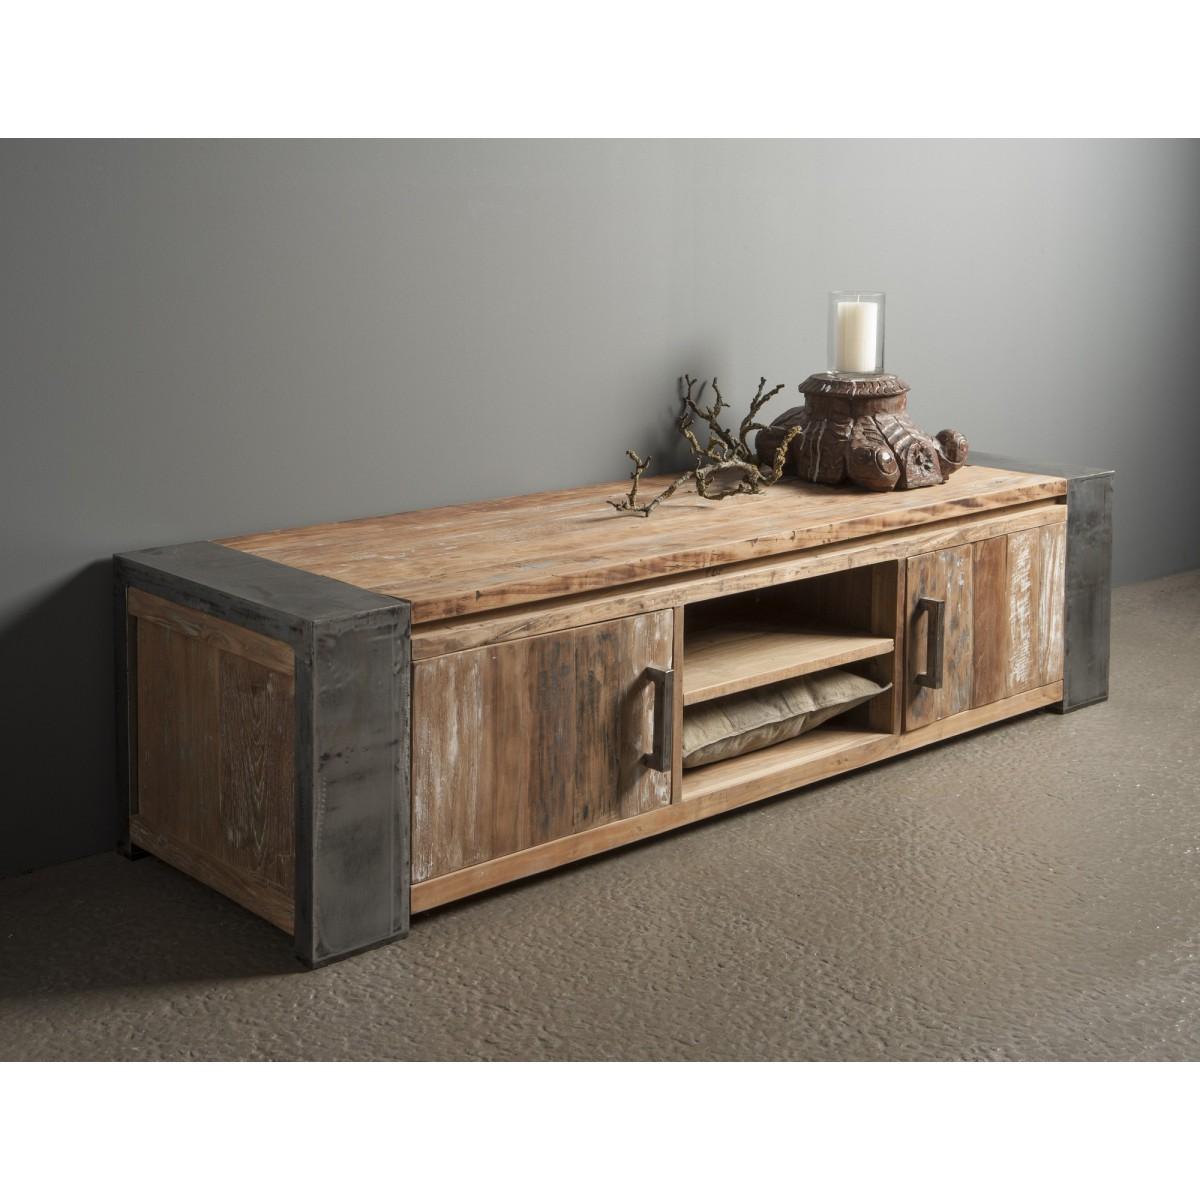 tv-dressoir-meubel-novara-teak-hout-metalen-poot-180-cm